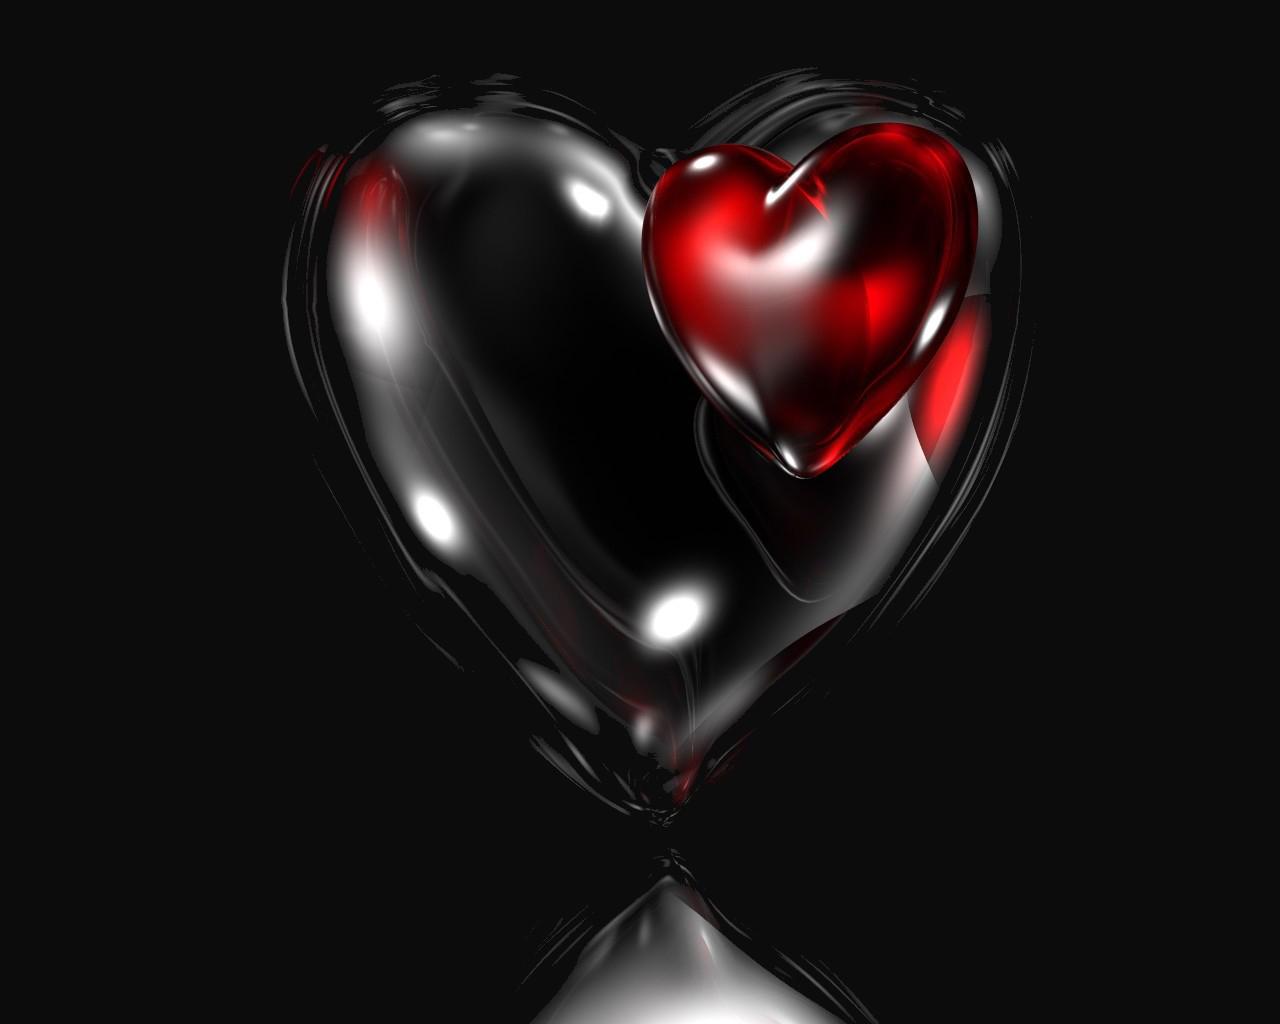 Abstract Wallpaper Black Hearts Blue 3d And Hd Wallpaper: Aşkın Resmi,Aşkın Şiiri: SANMAKİ SENİ GERÇEKTEN SEVEN